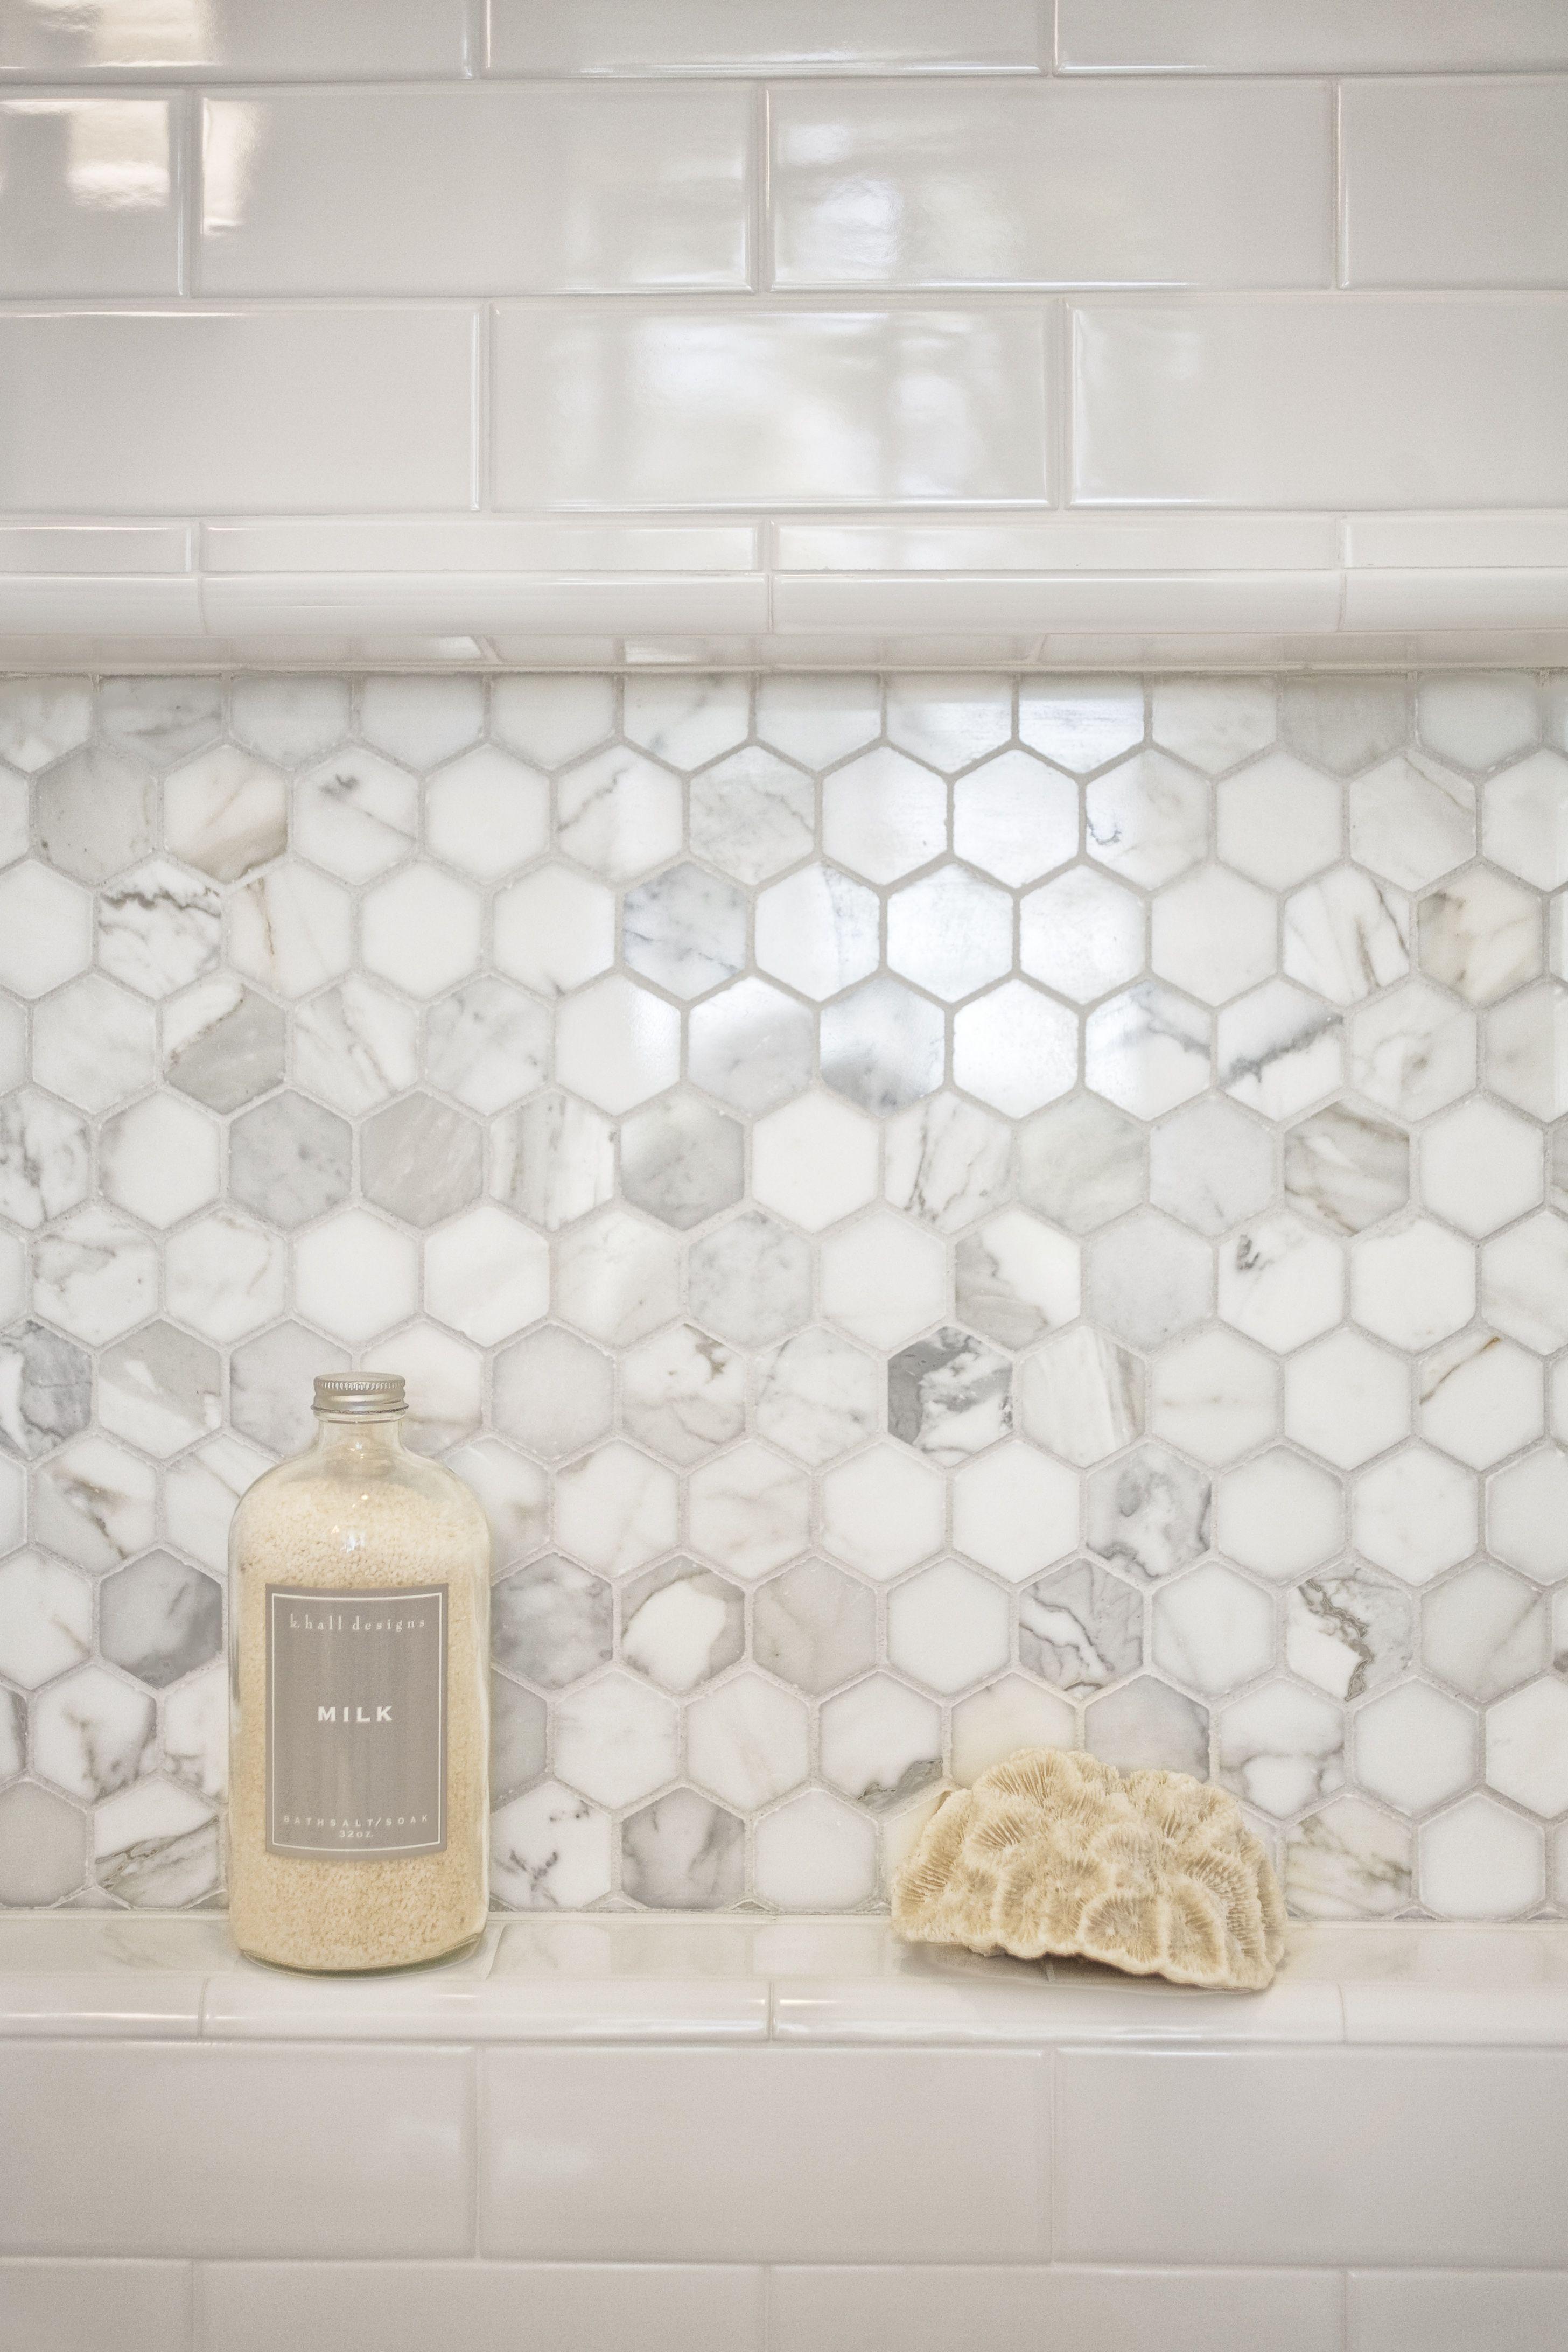 39+ Fancy Hexagon Tiles Mold - Decortez #bathroomtiledesigns